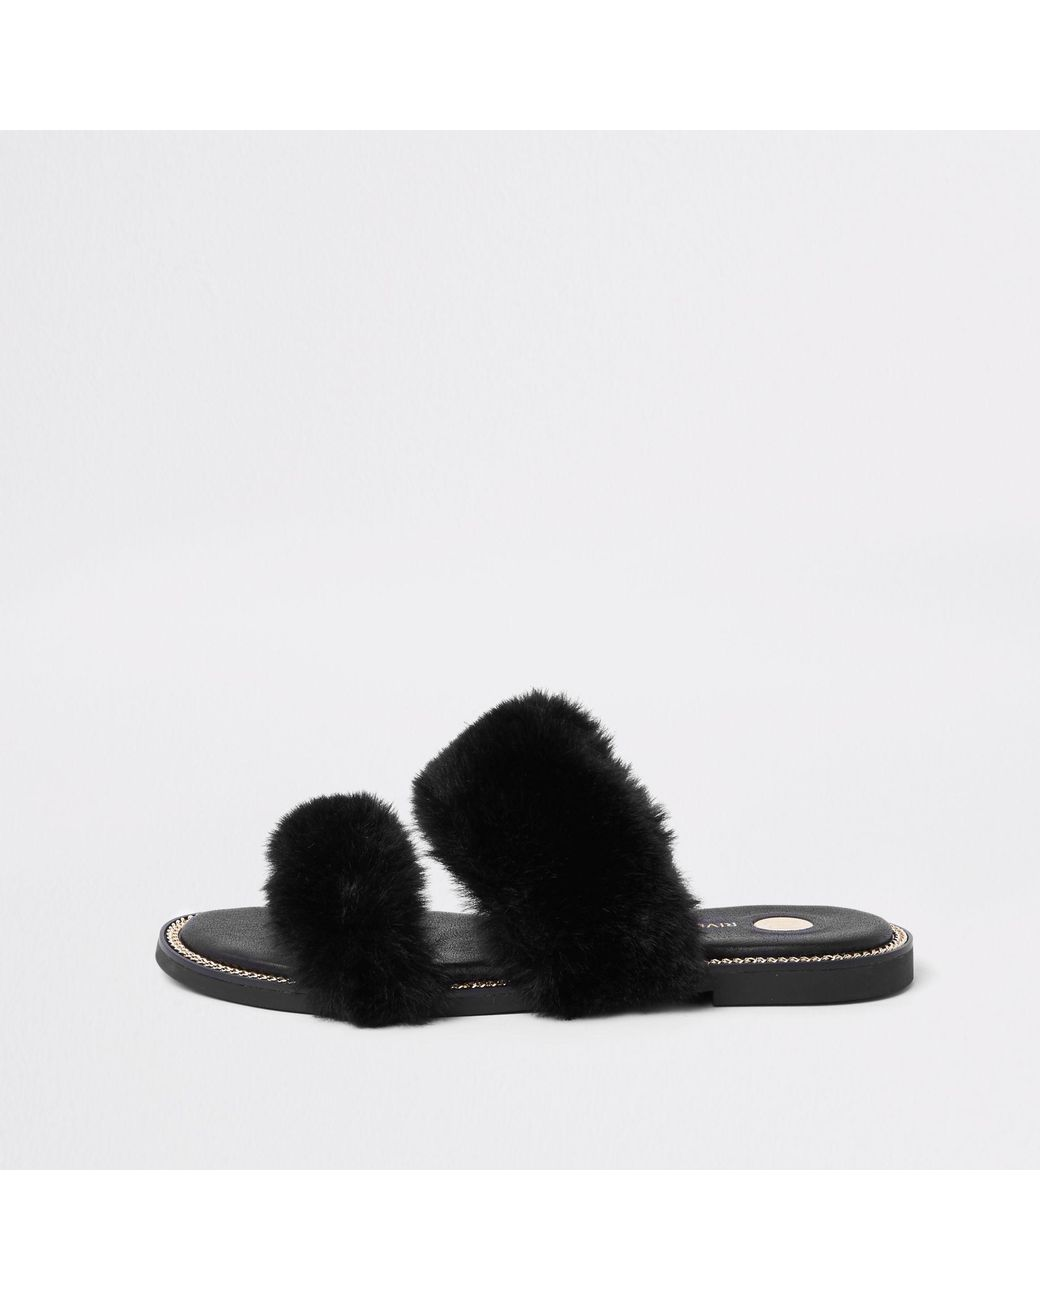 0573d969ba7 River Island Faux Fur Chain Trim Sandals in Black - Lyst